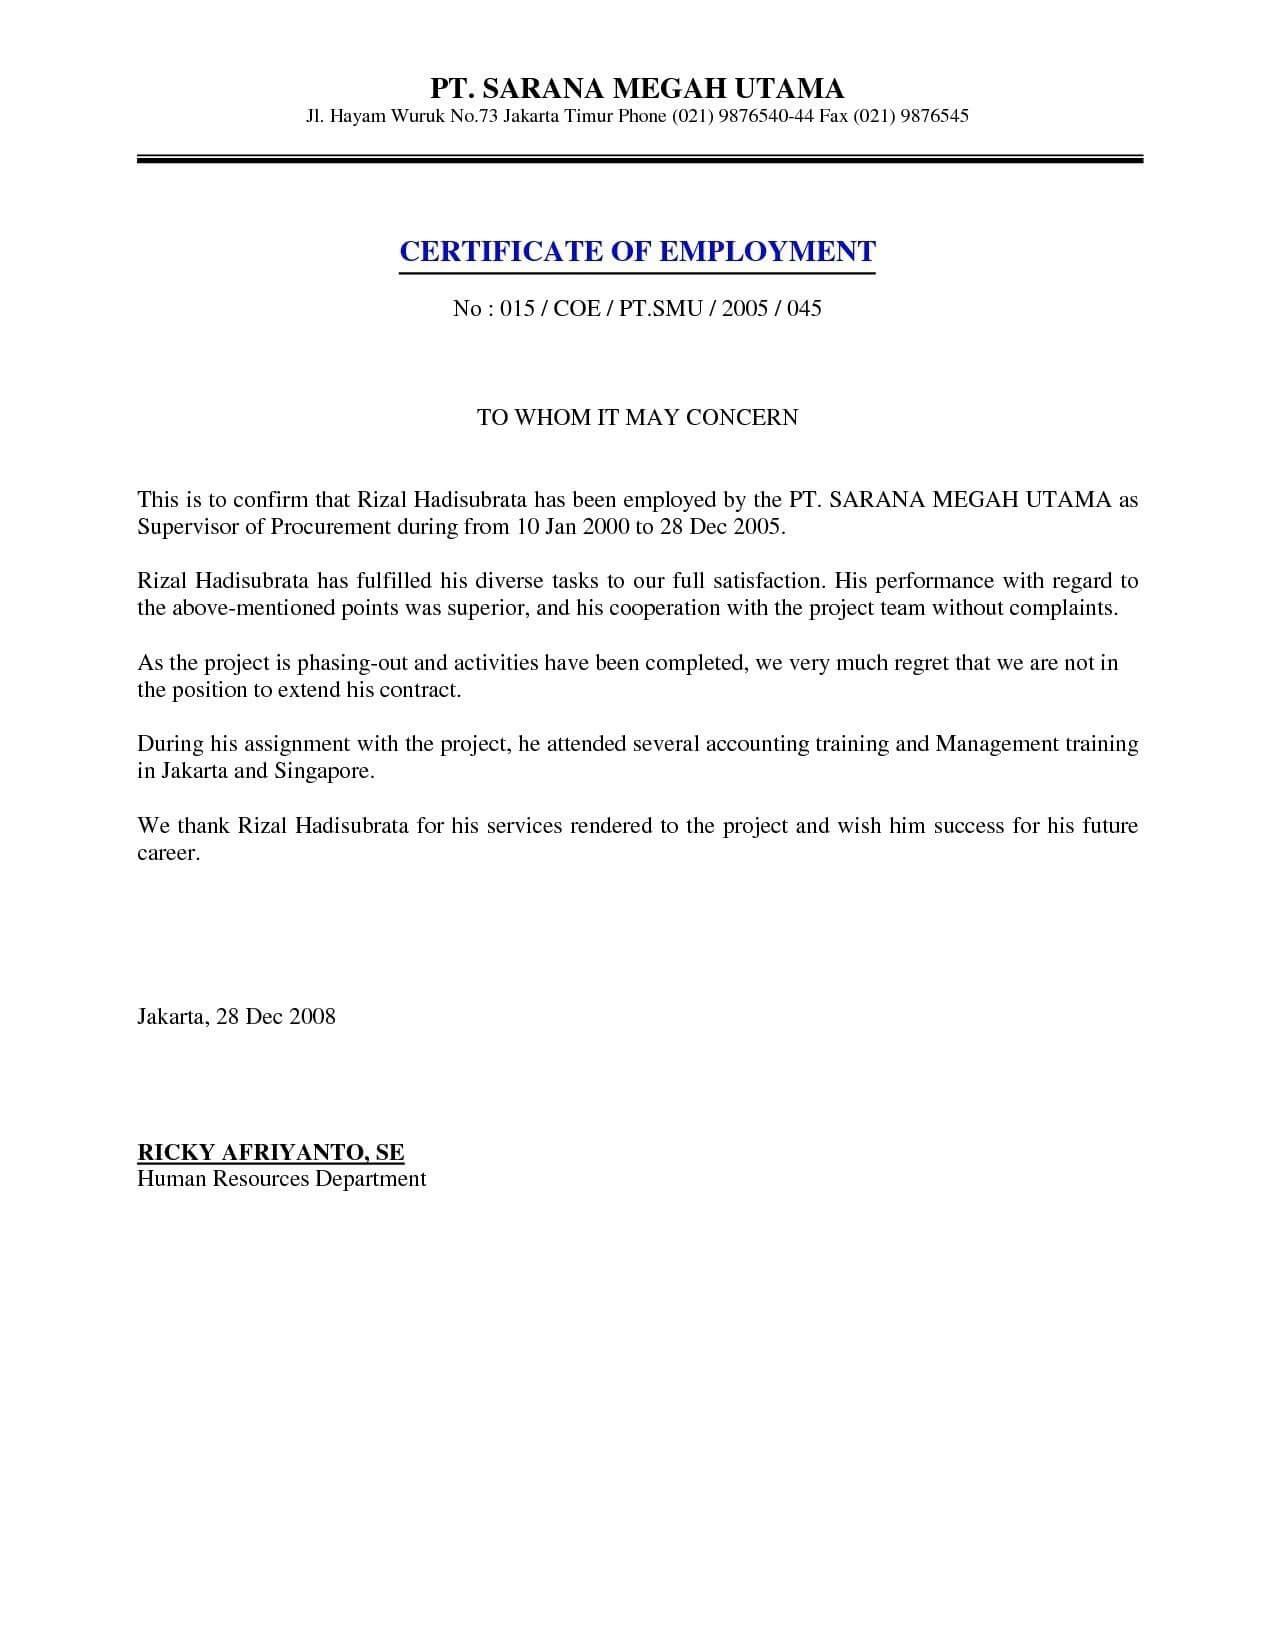 Certificate Of Employment Sample Beautiful Sample Regarding Certificate Of Employment Template